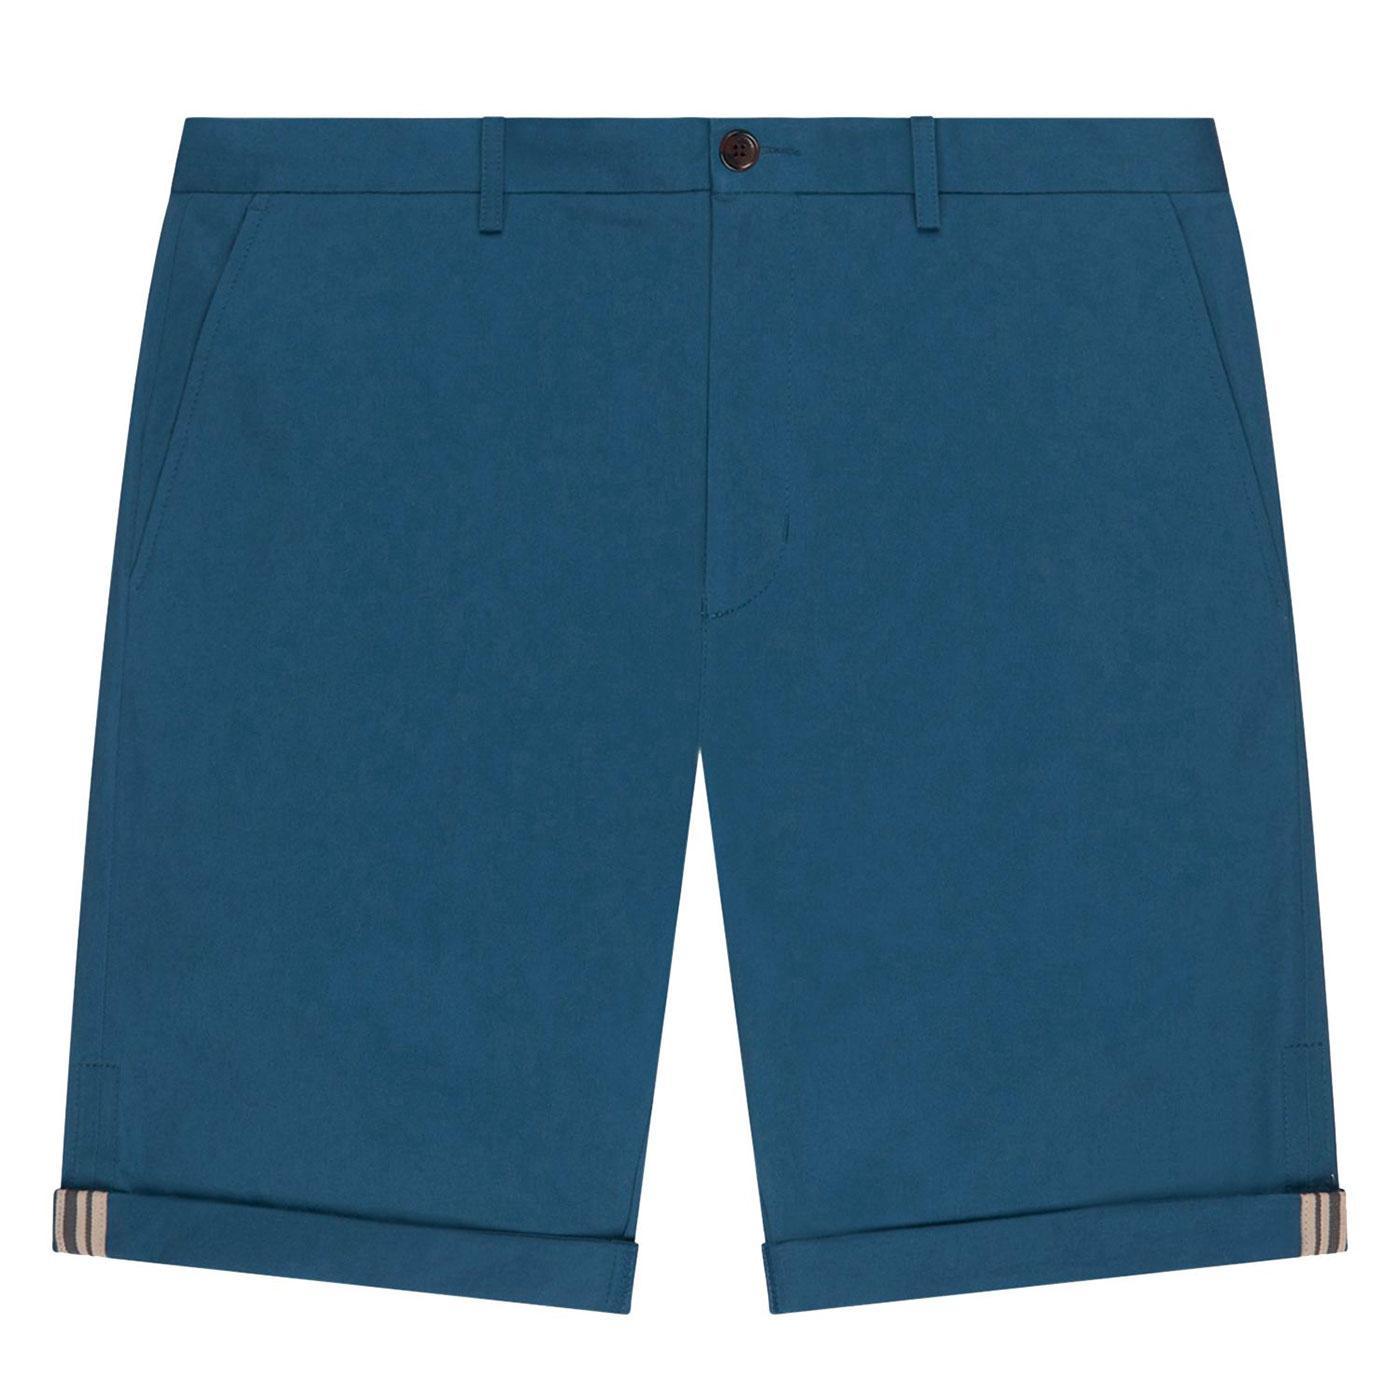 BEN SHERMAN Men's Retro Mod Chino Shorts in Indigo